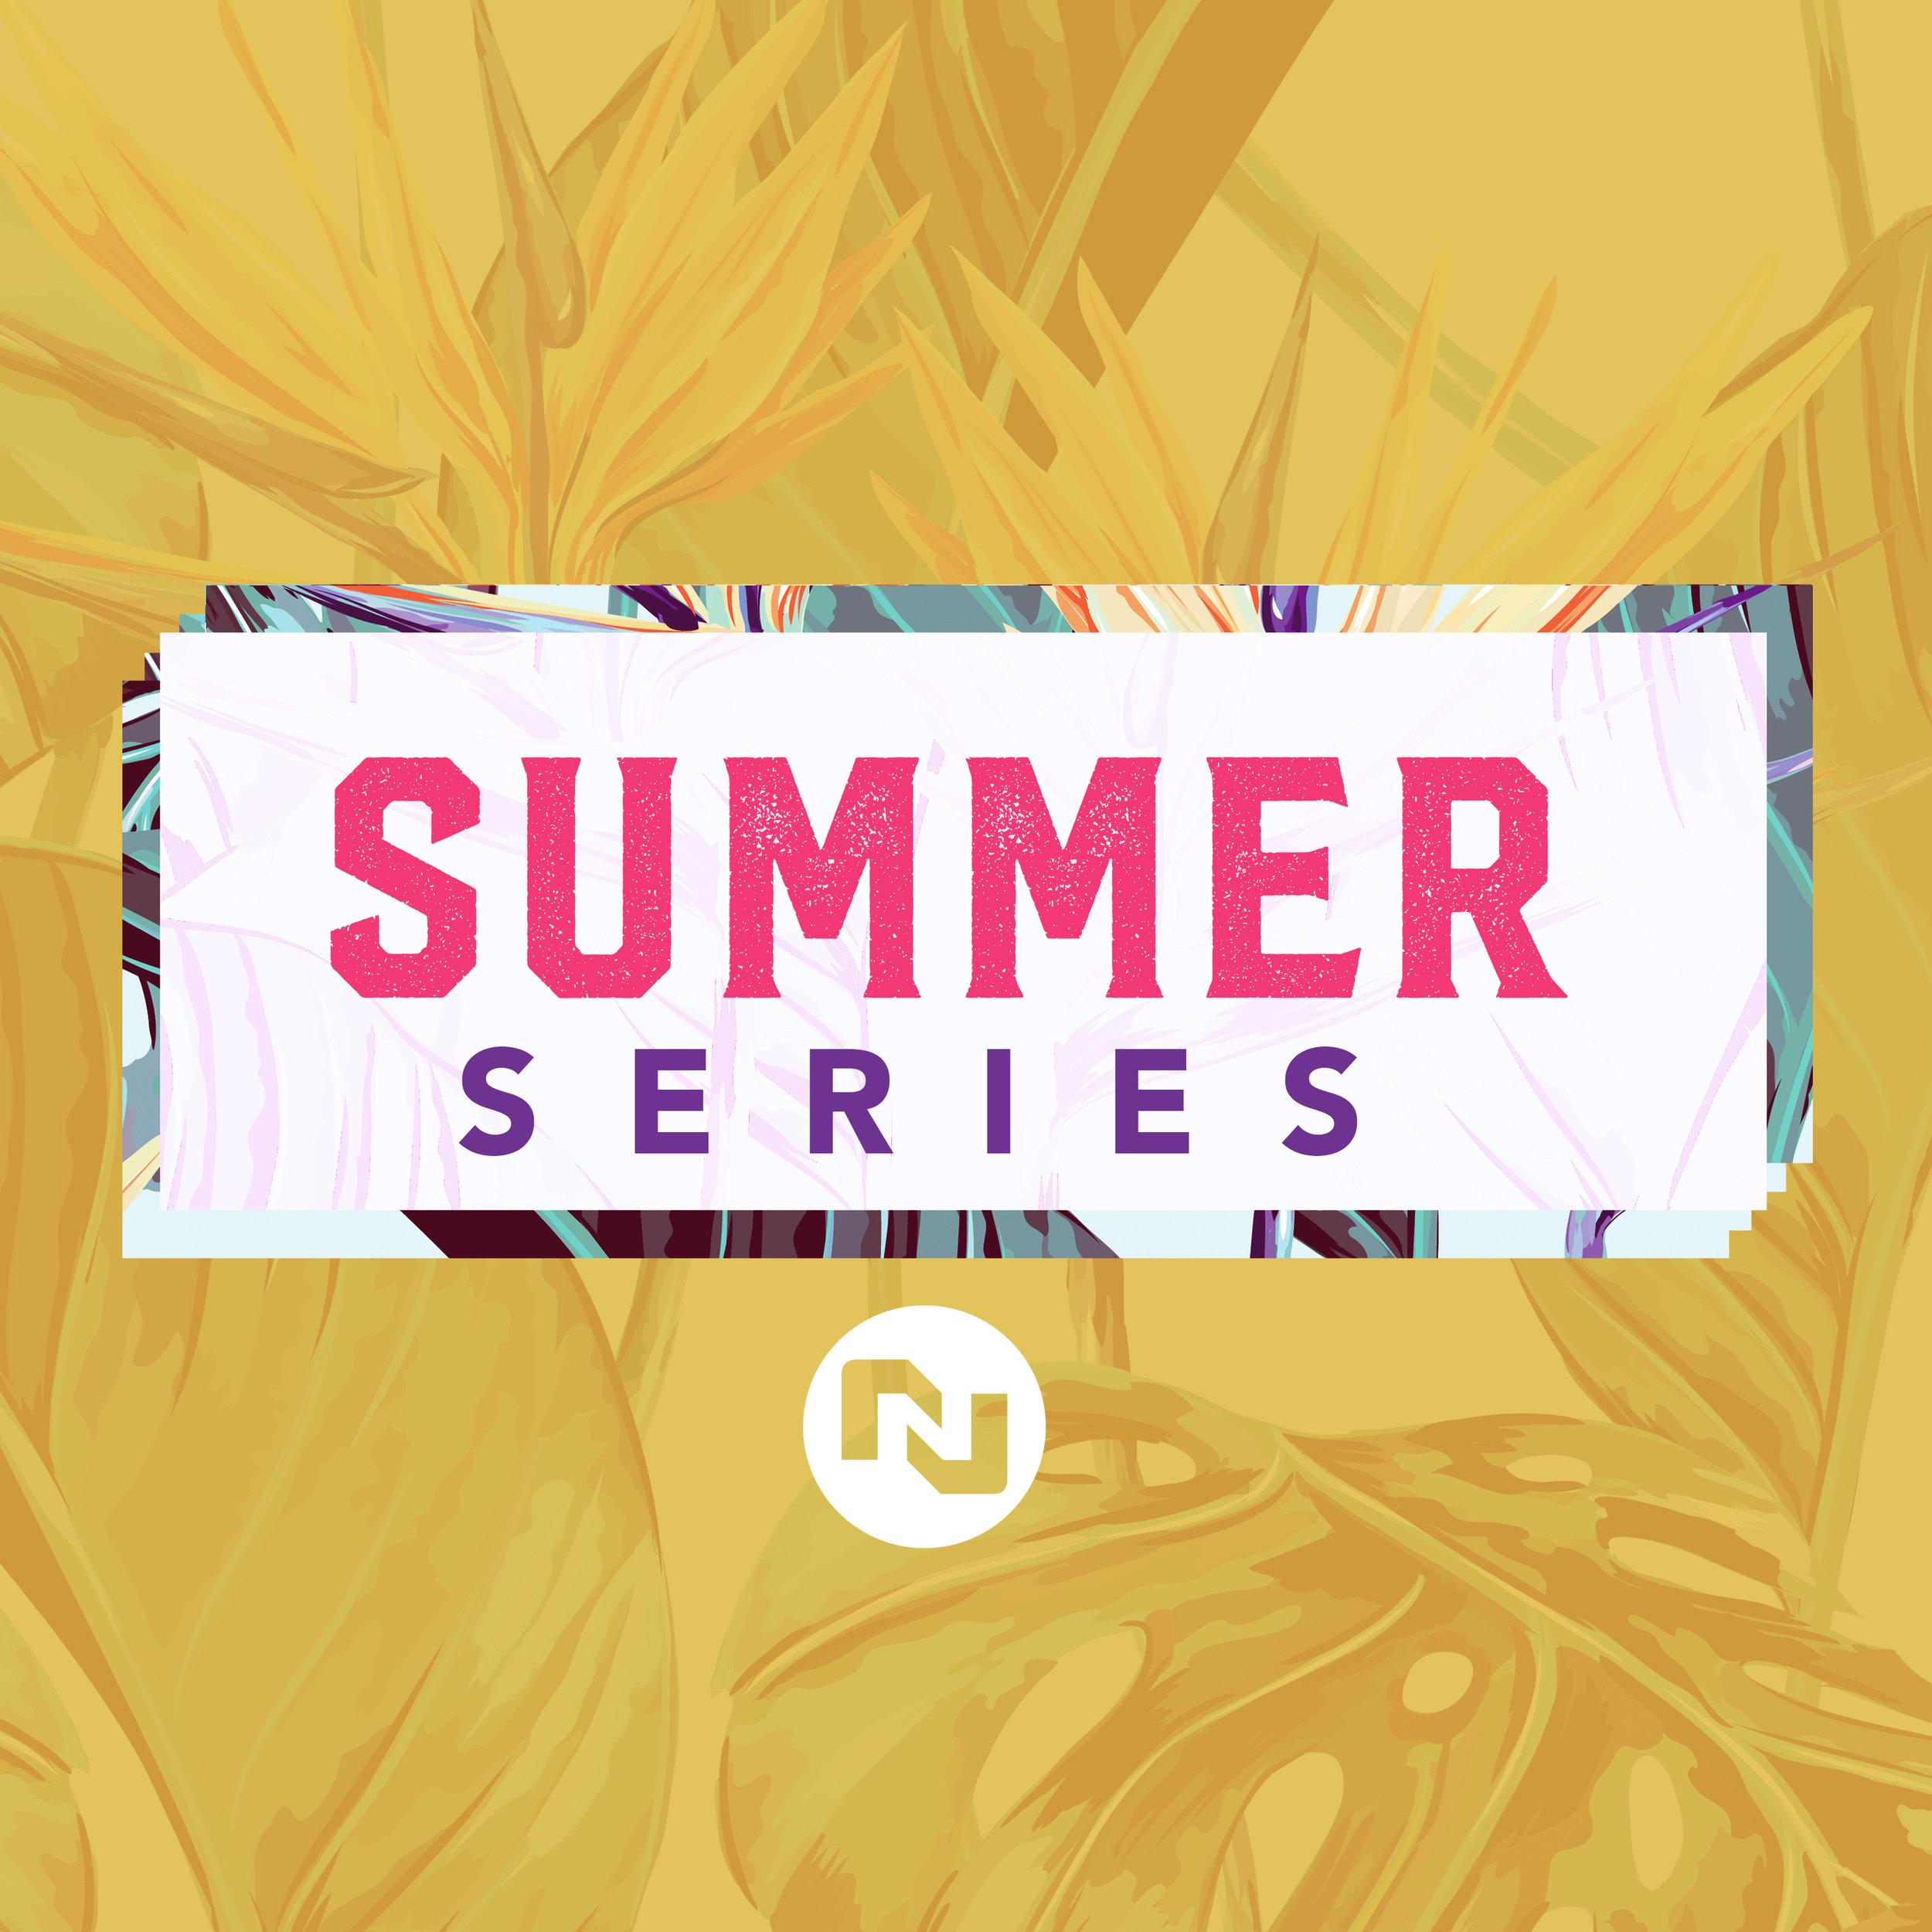 Summer Series Square.jpg